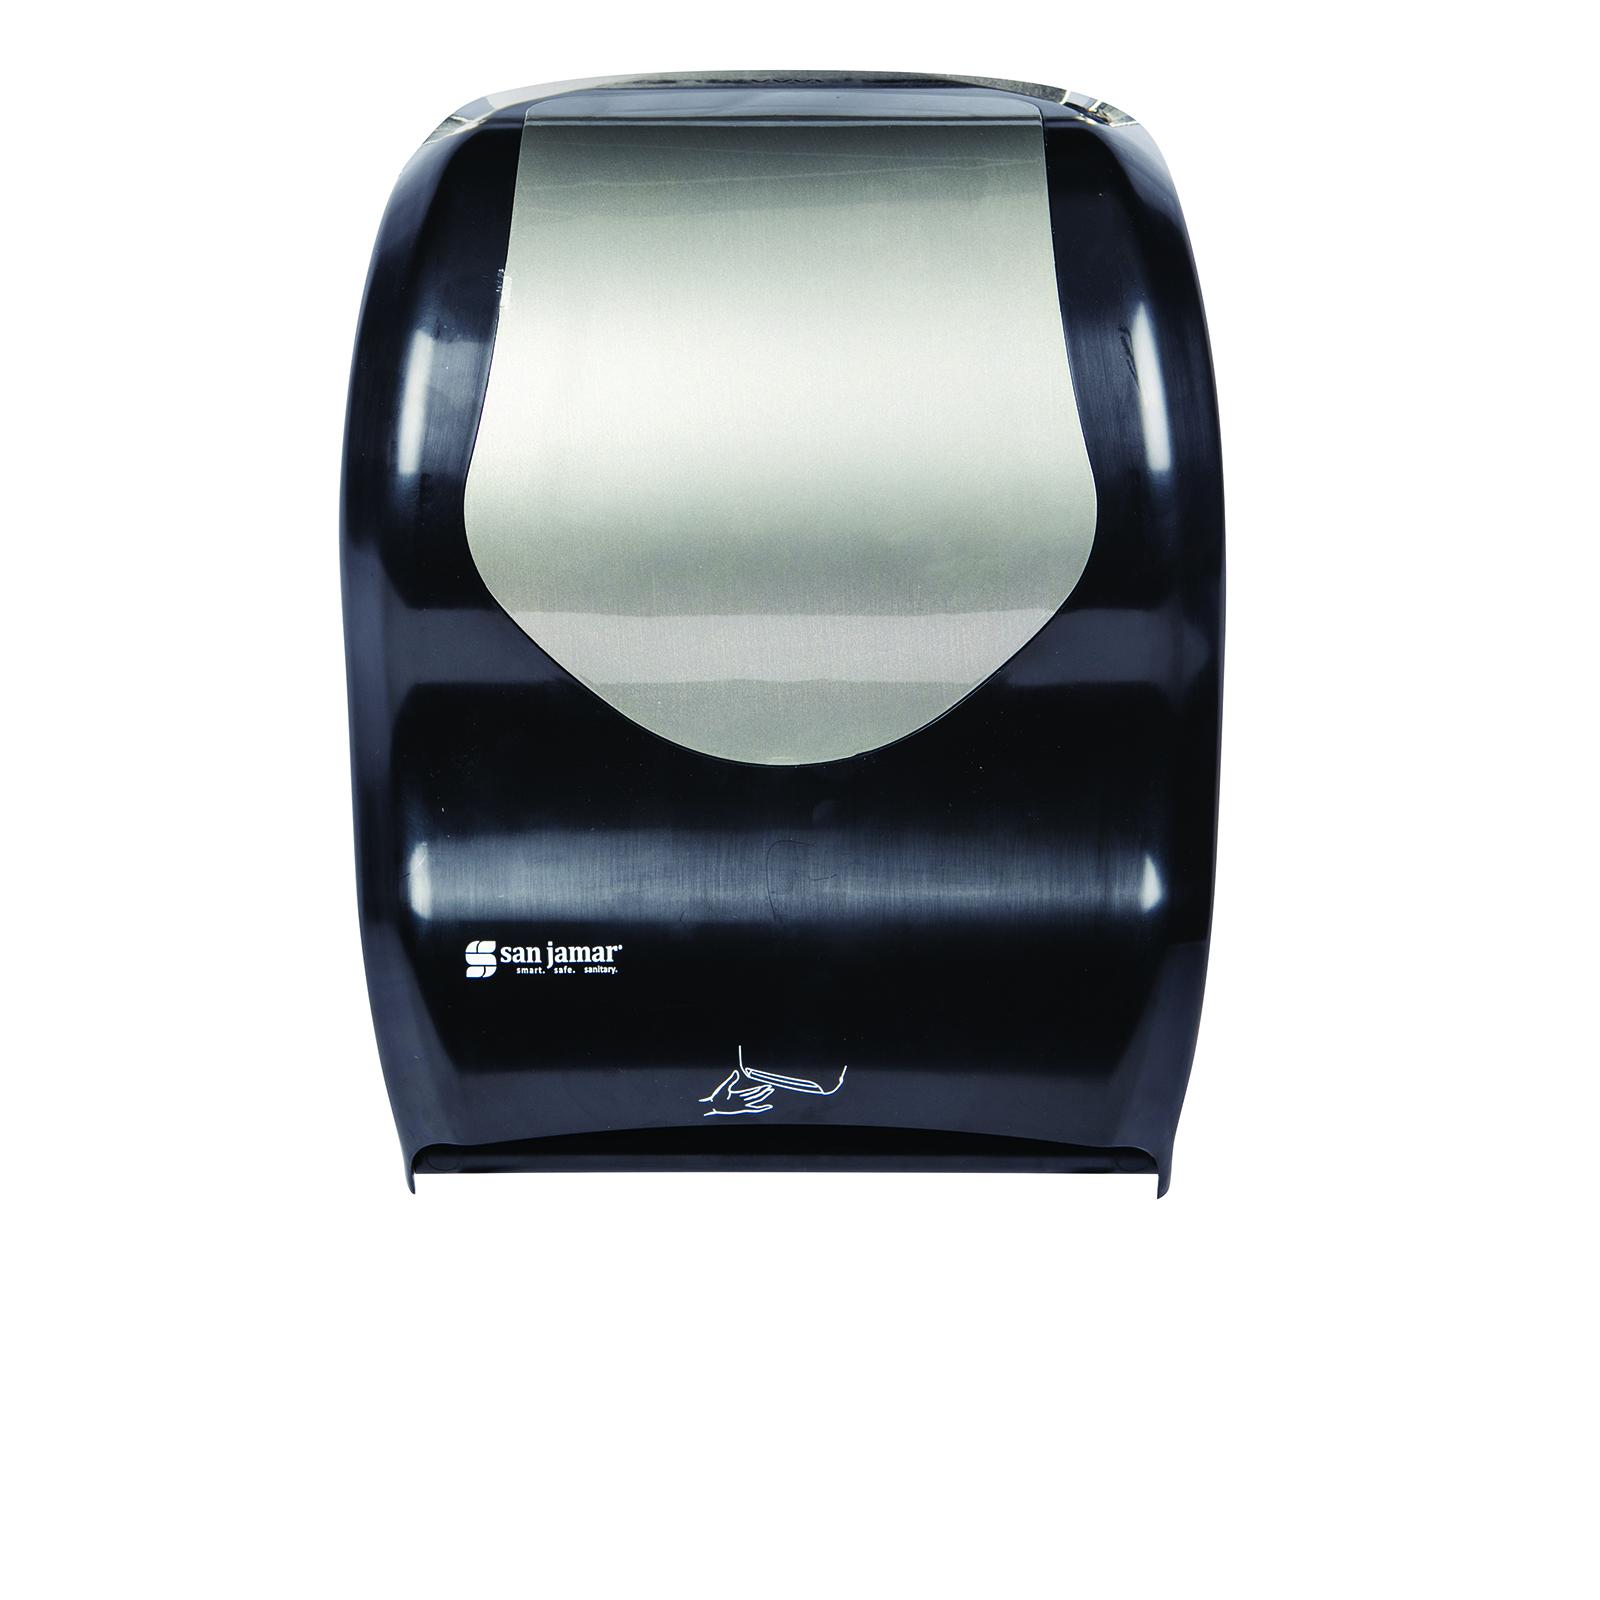 San Jamar T1470BKSS paper towel dispenser